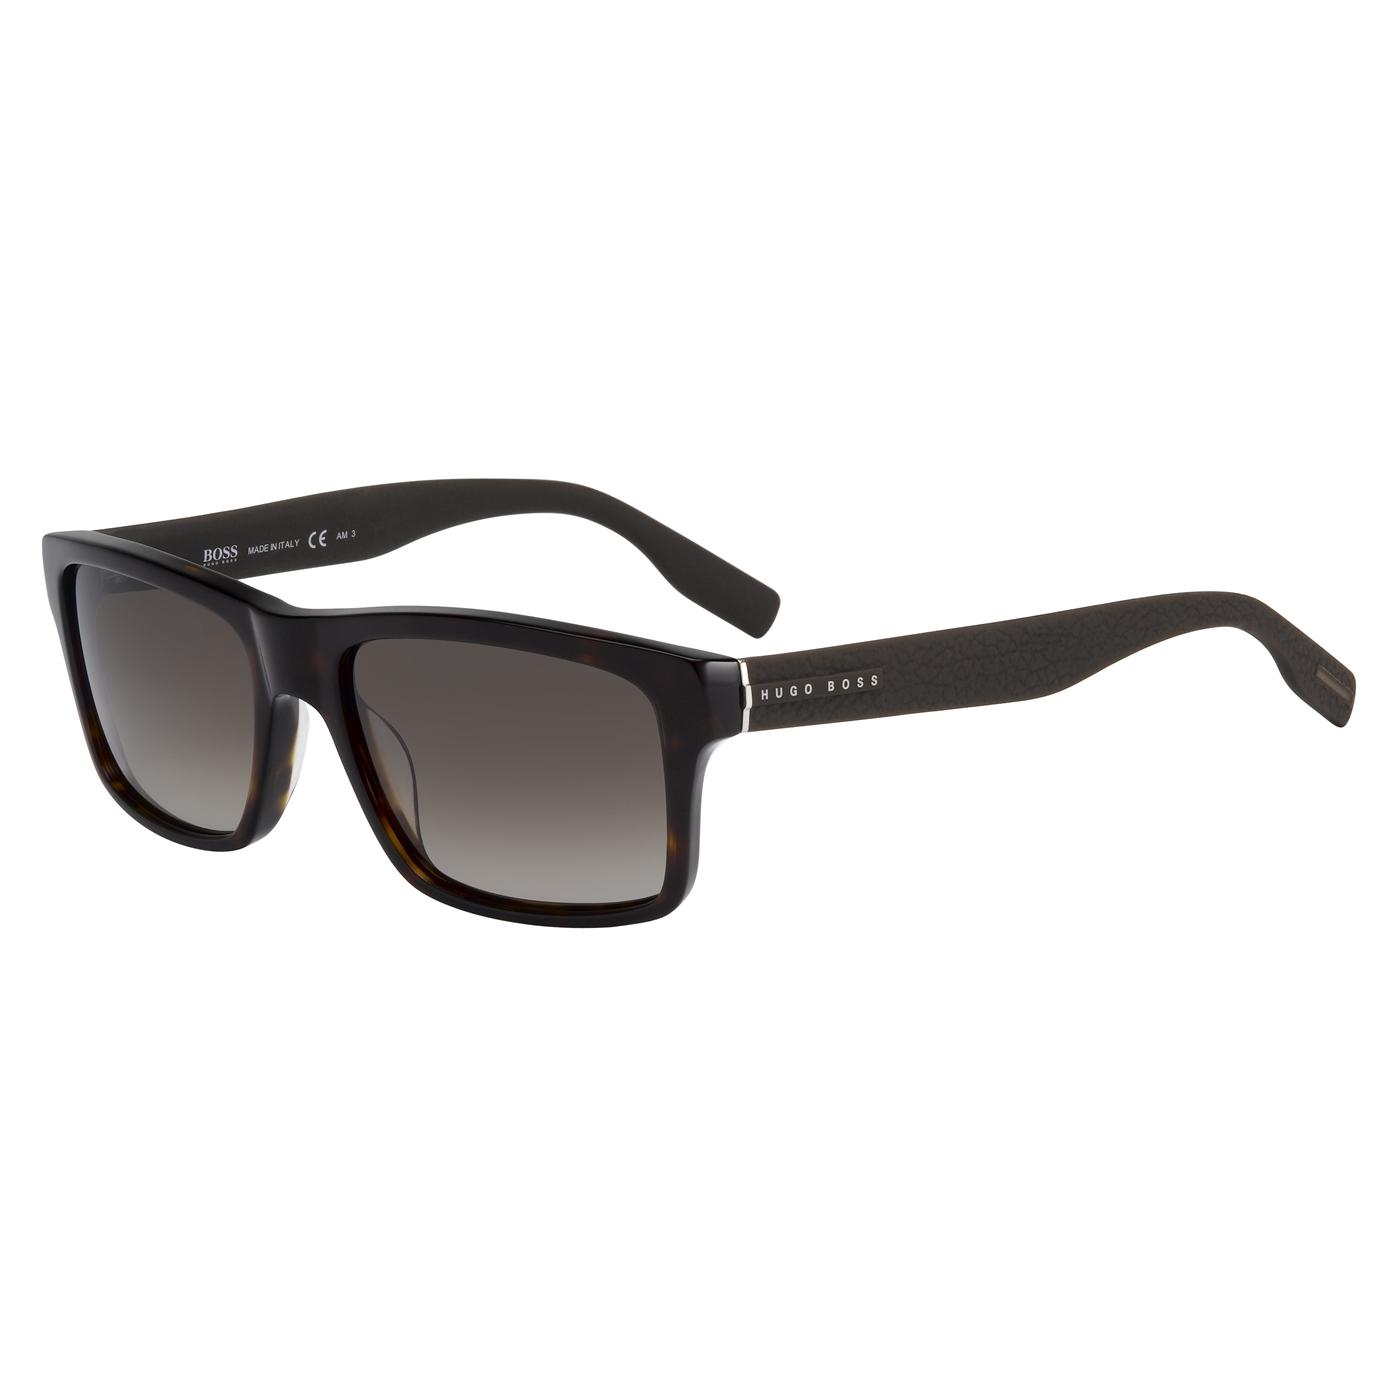 Bilde av Boss Dark Havana Sunglasses BOSS 0509NS 086 55 HA